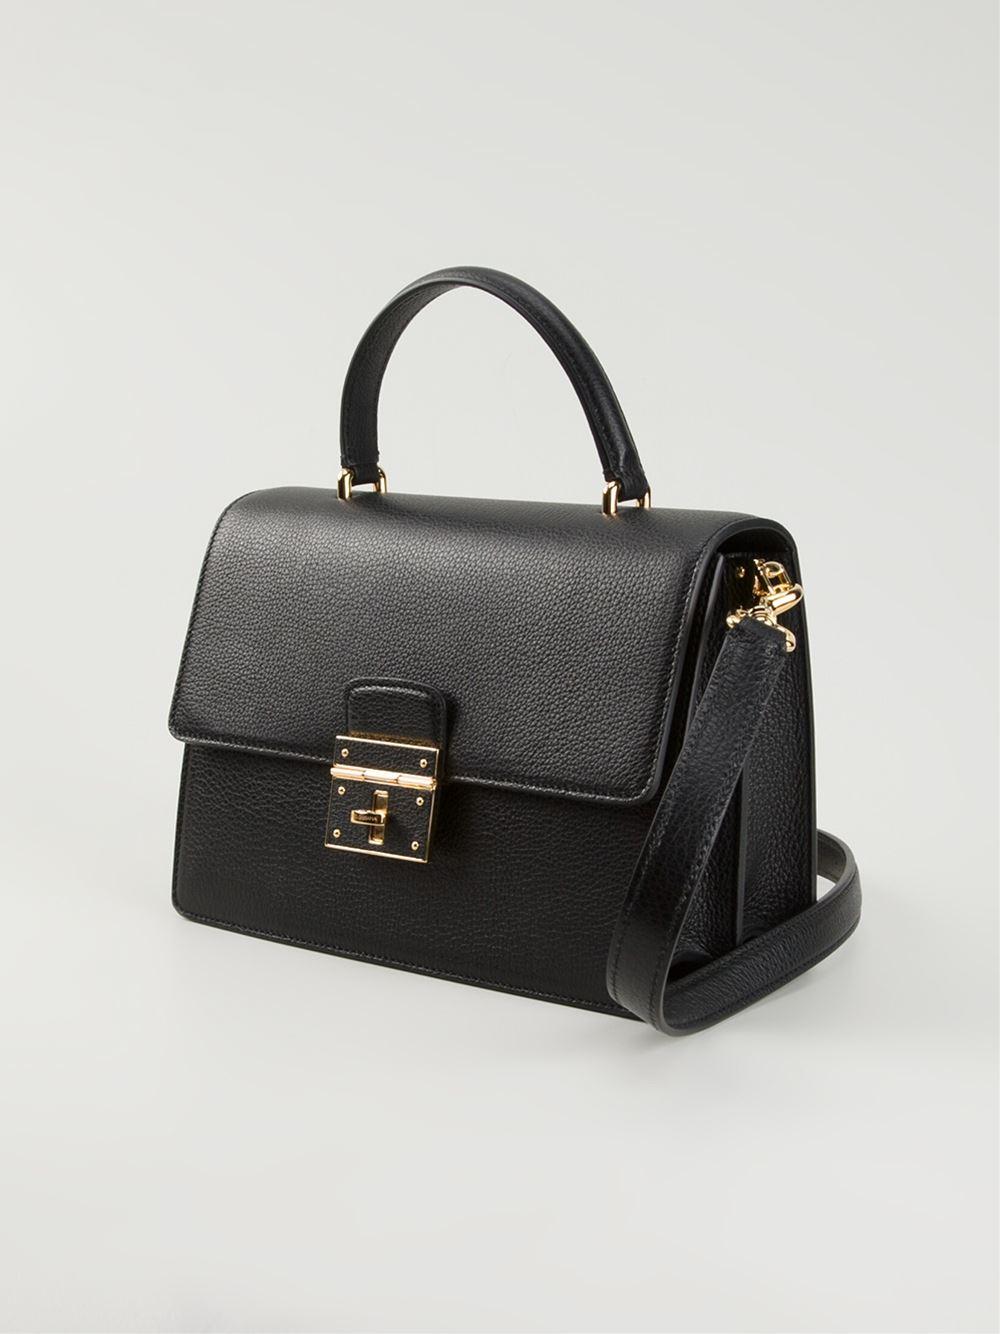 02524abc1f1 Dolce   Gabbana  Rosalia  Shoulder Bag in Black - Lyst